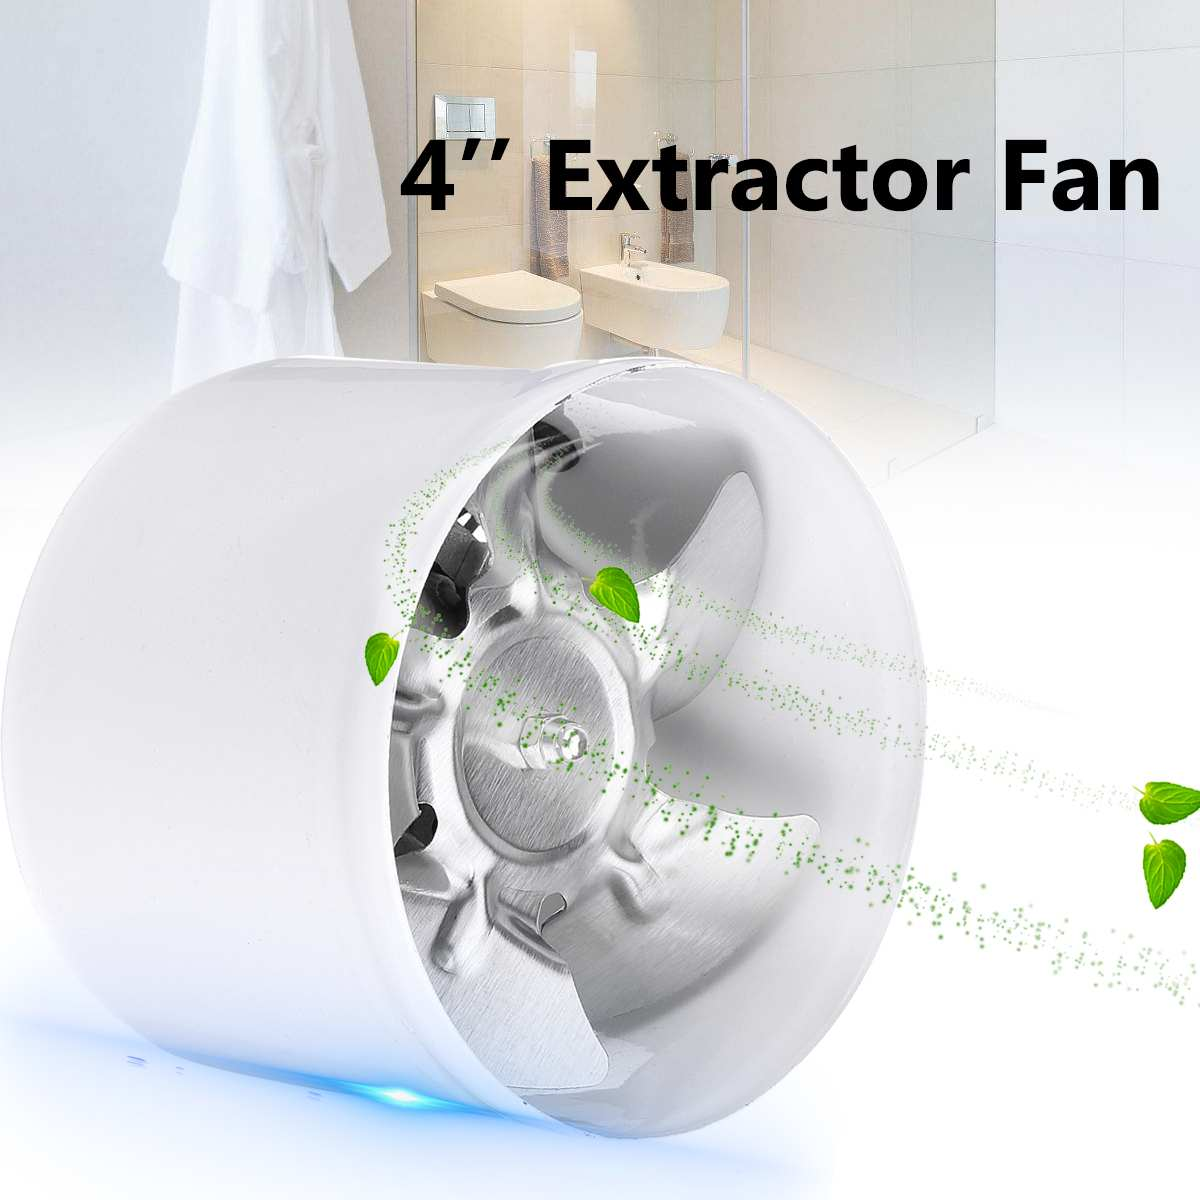 220V 4'' 25W Exhaust Blower Silent Wall Extractor Ventilation Fan Window Bathroom Kitchen Toilet Cooling Vents Ventilator Fan